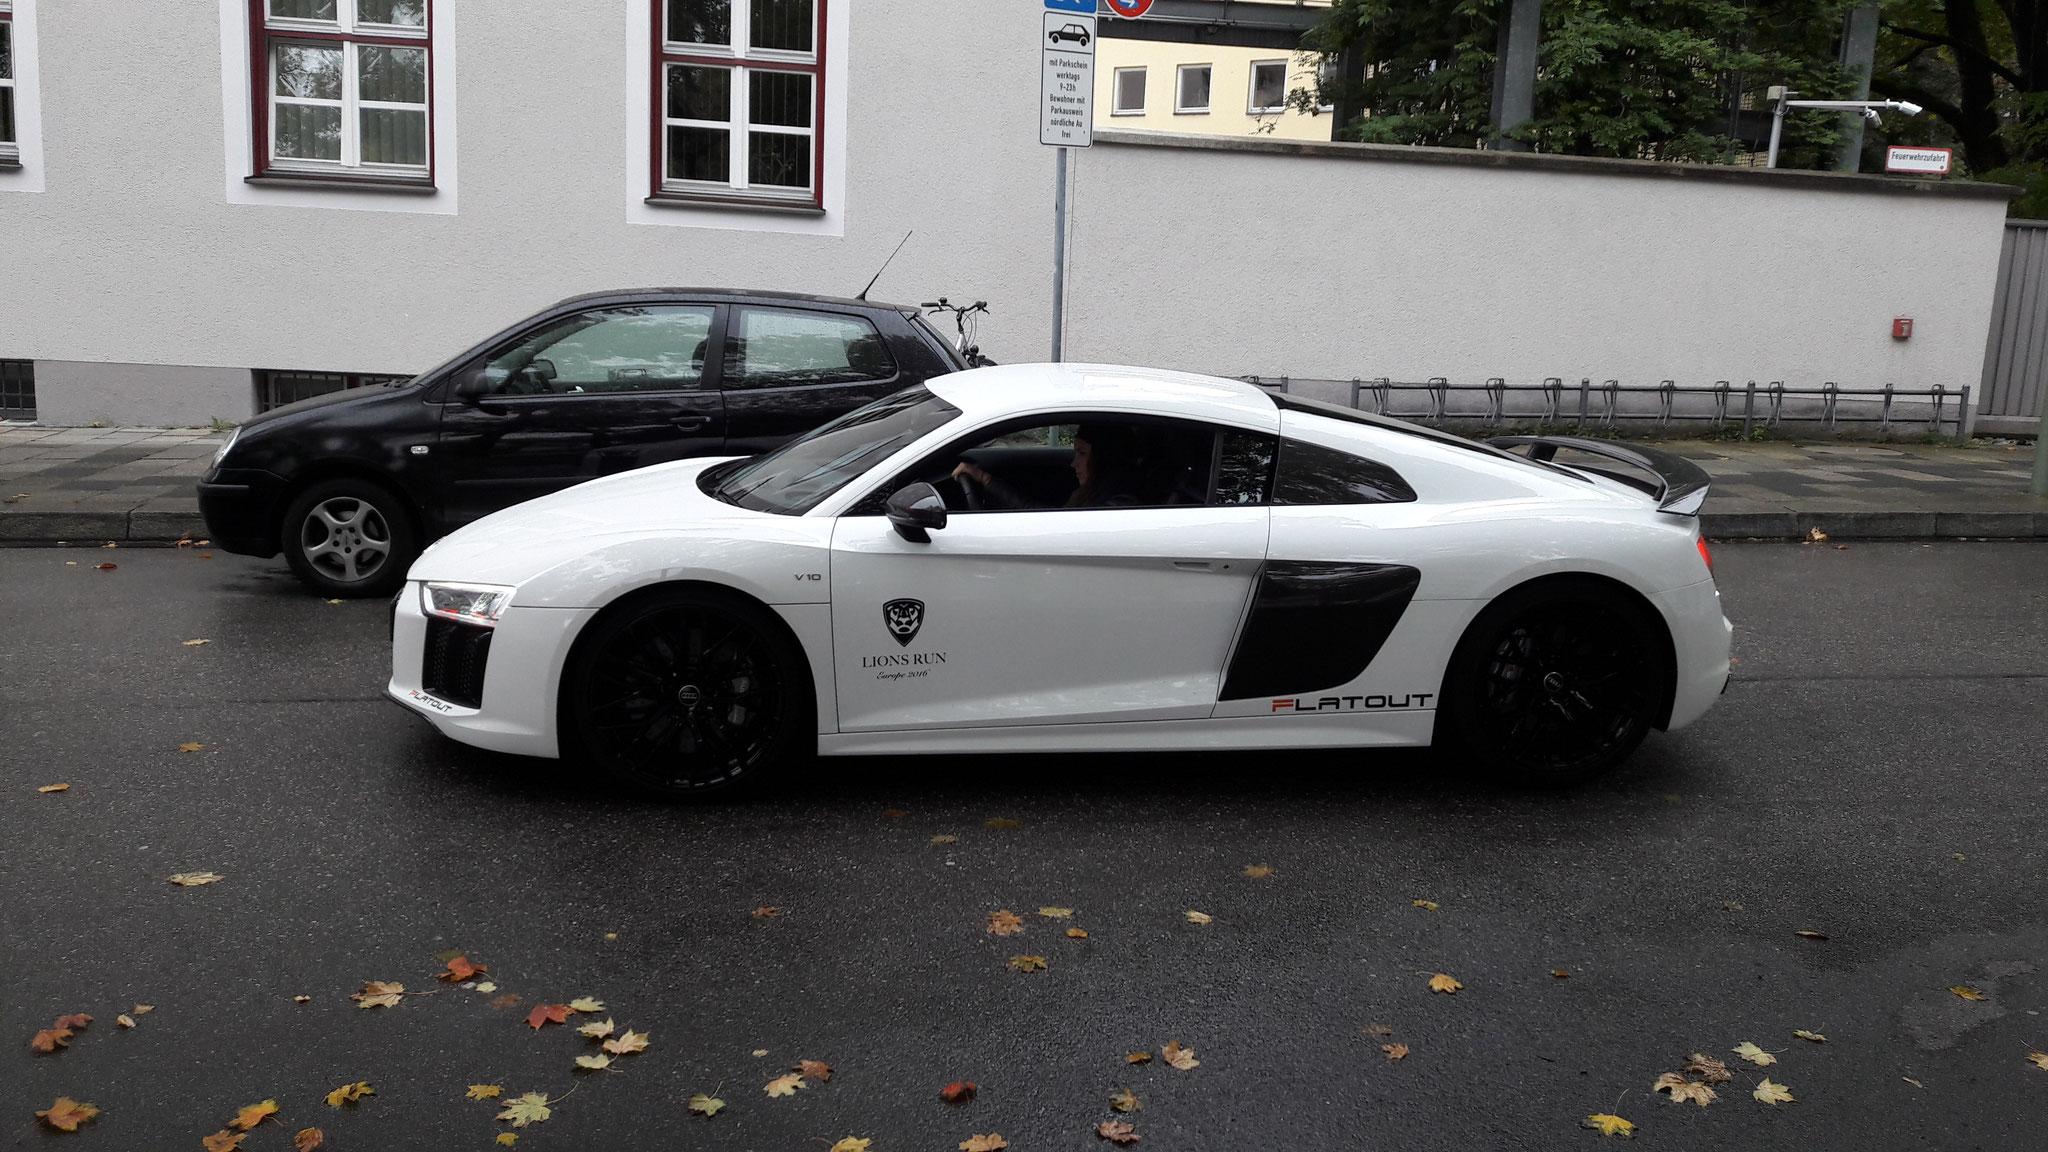 Audi R8 V10 - EBE-Q-9000